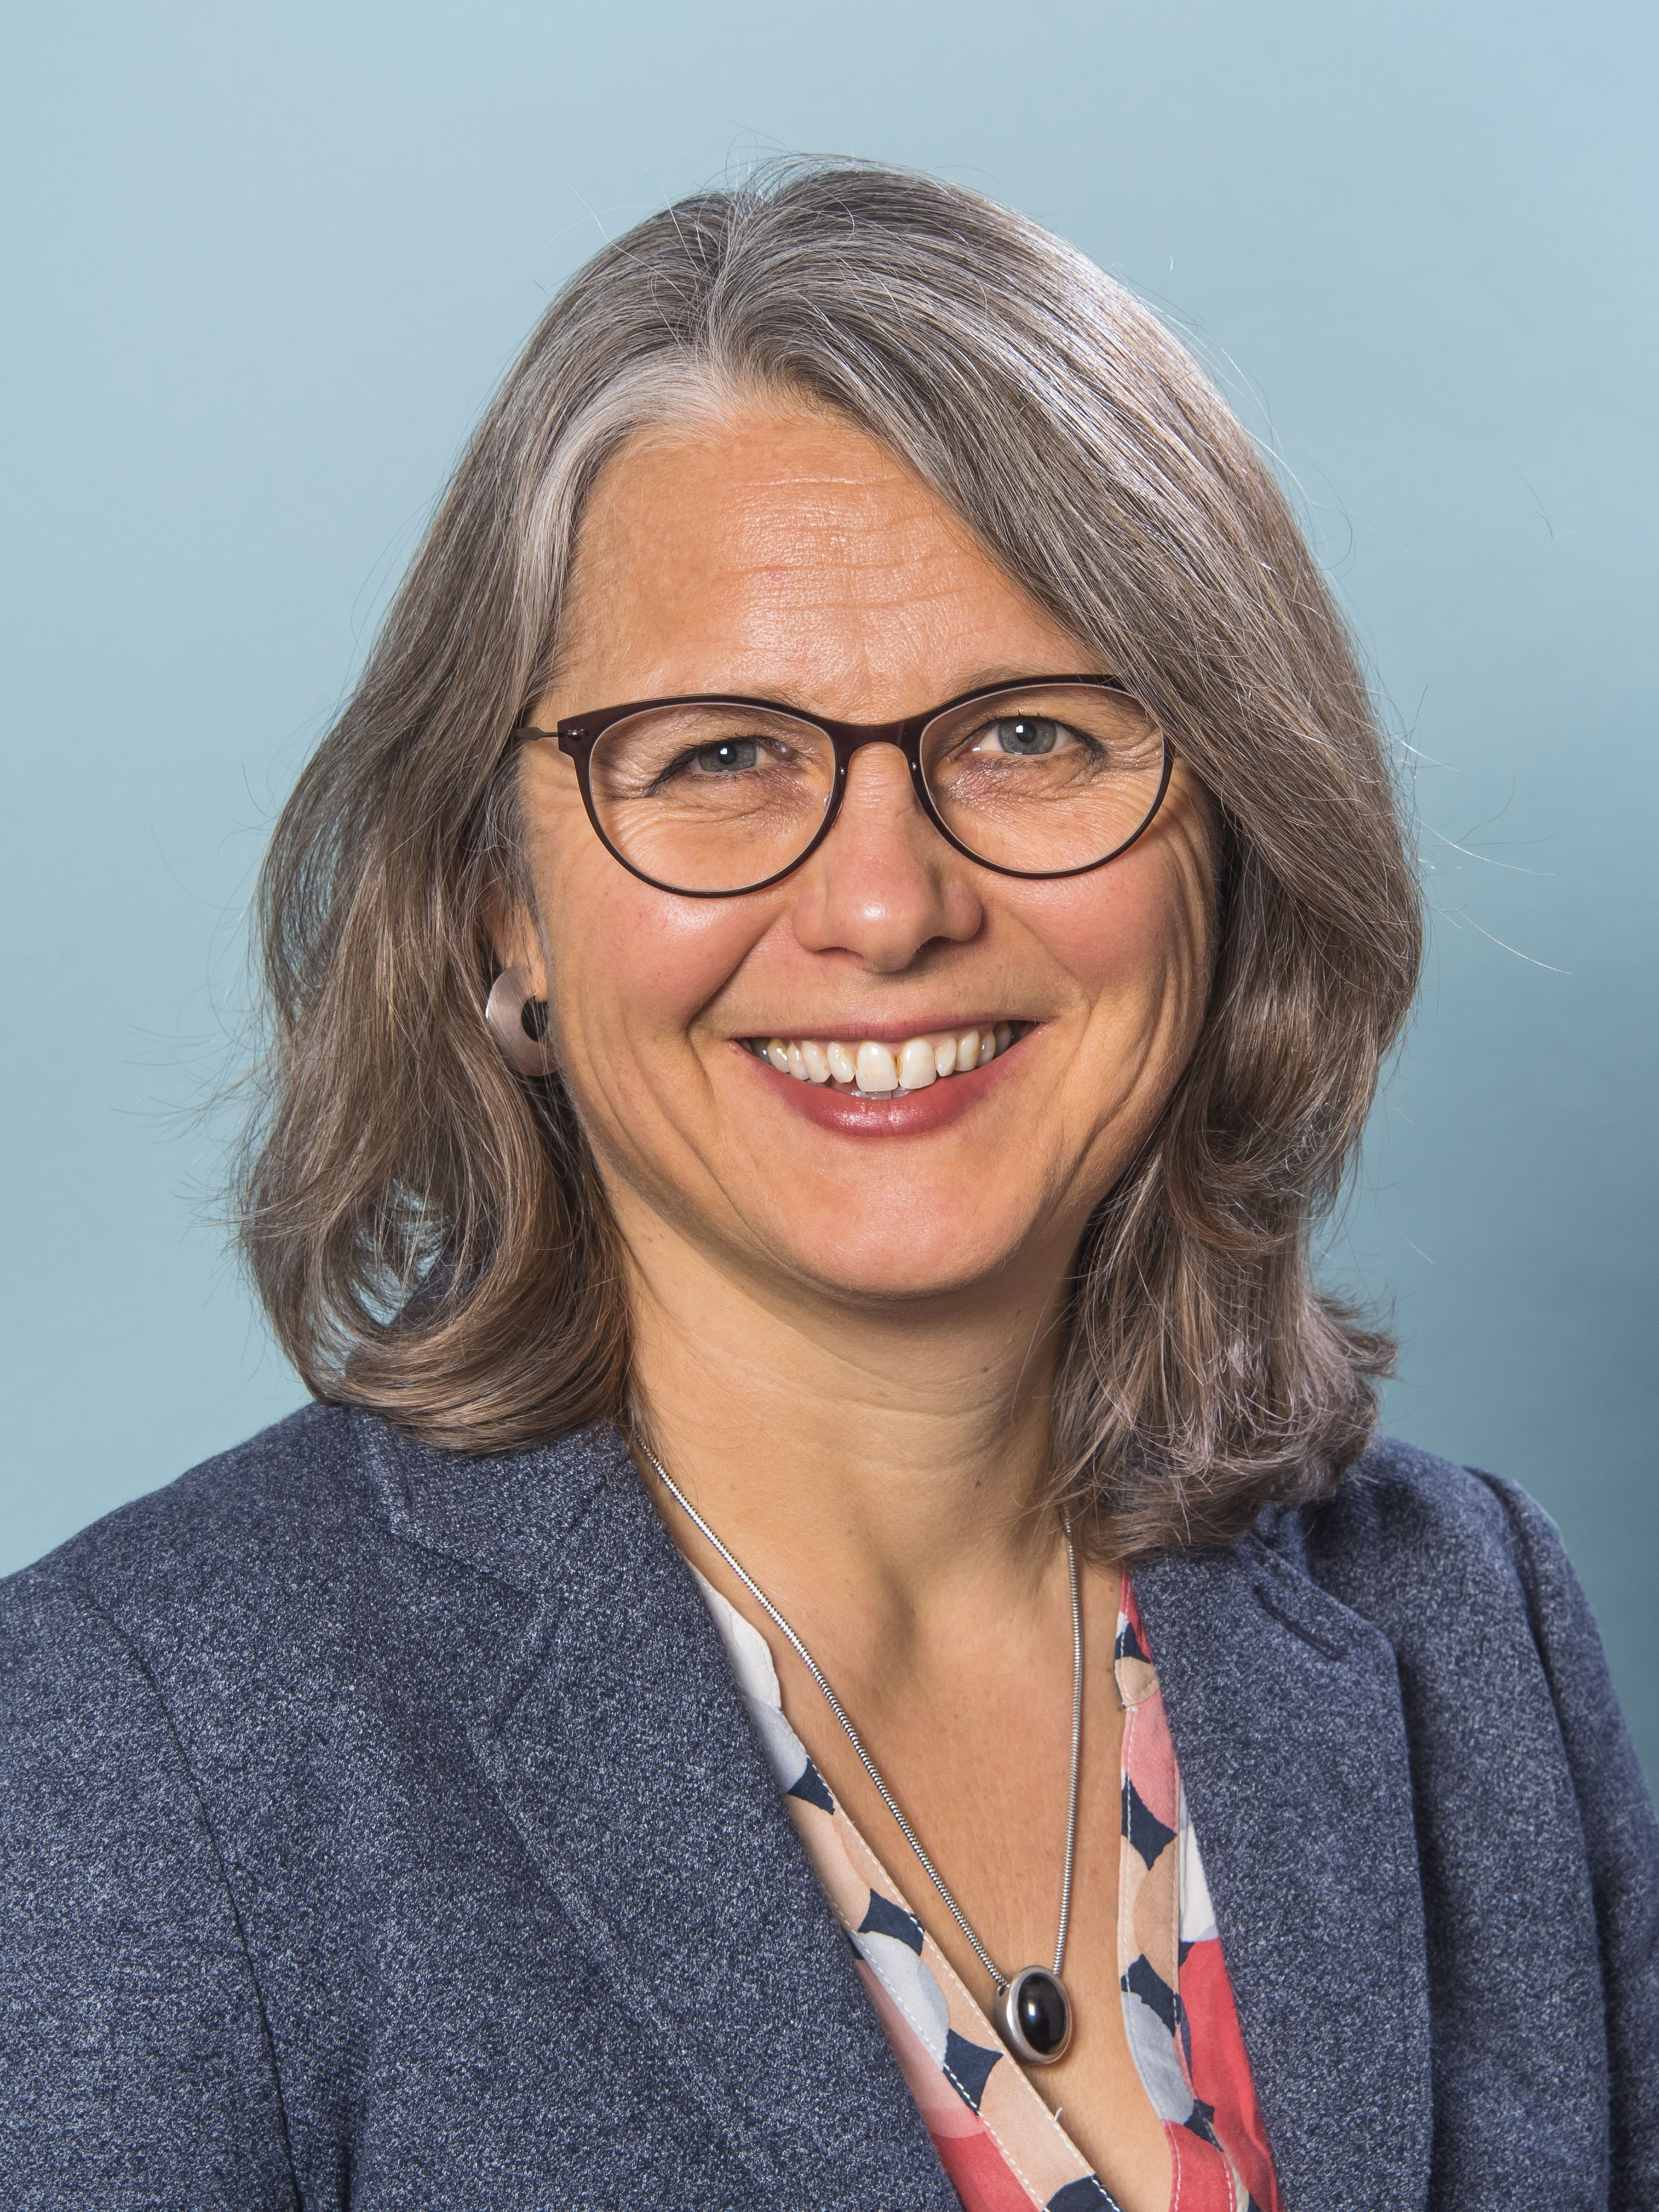 Kerstin Bonk